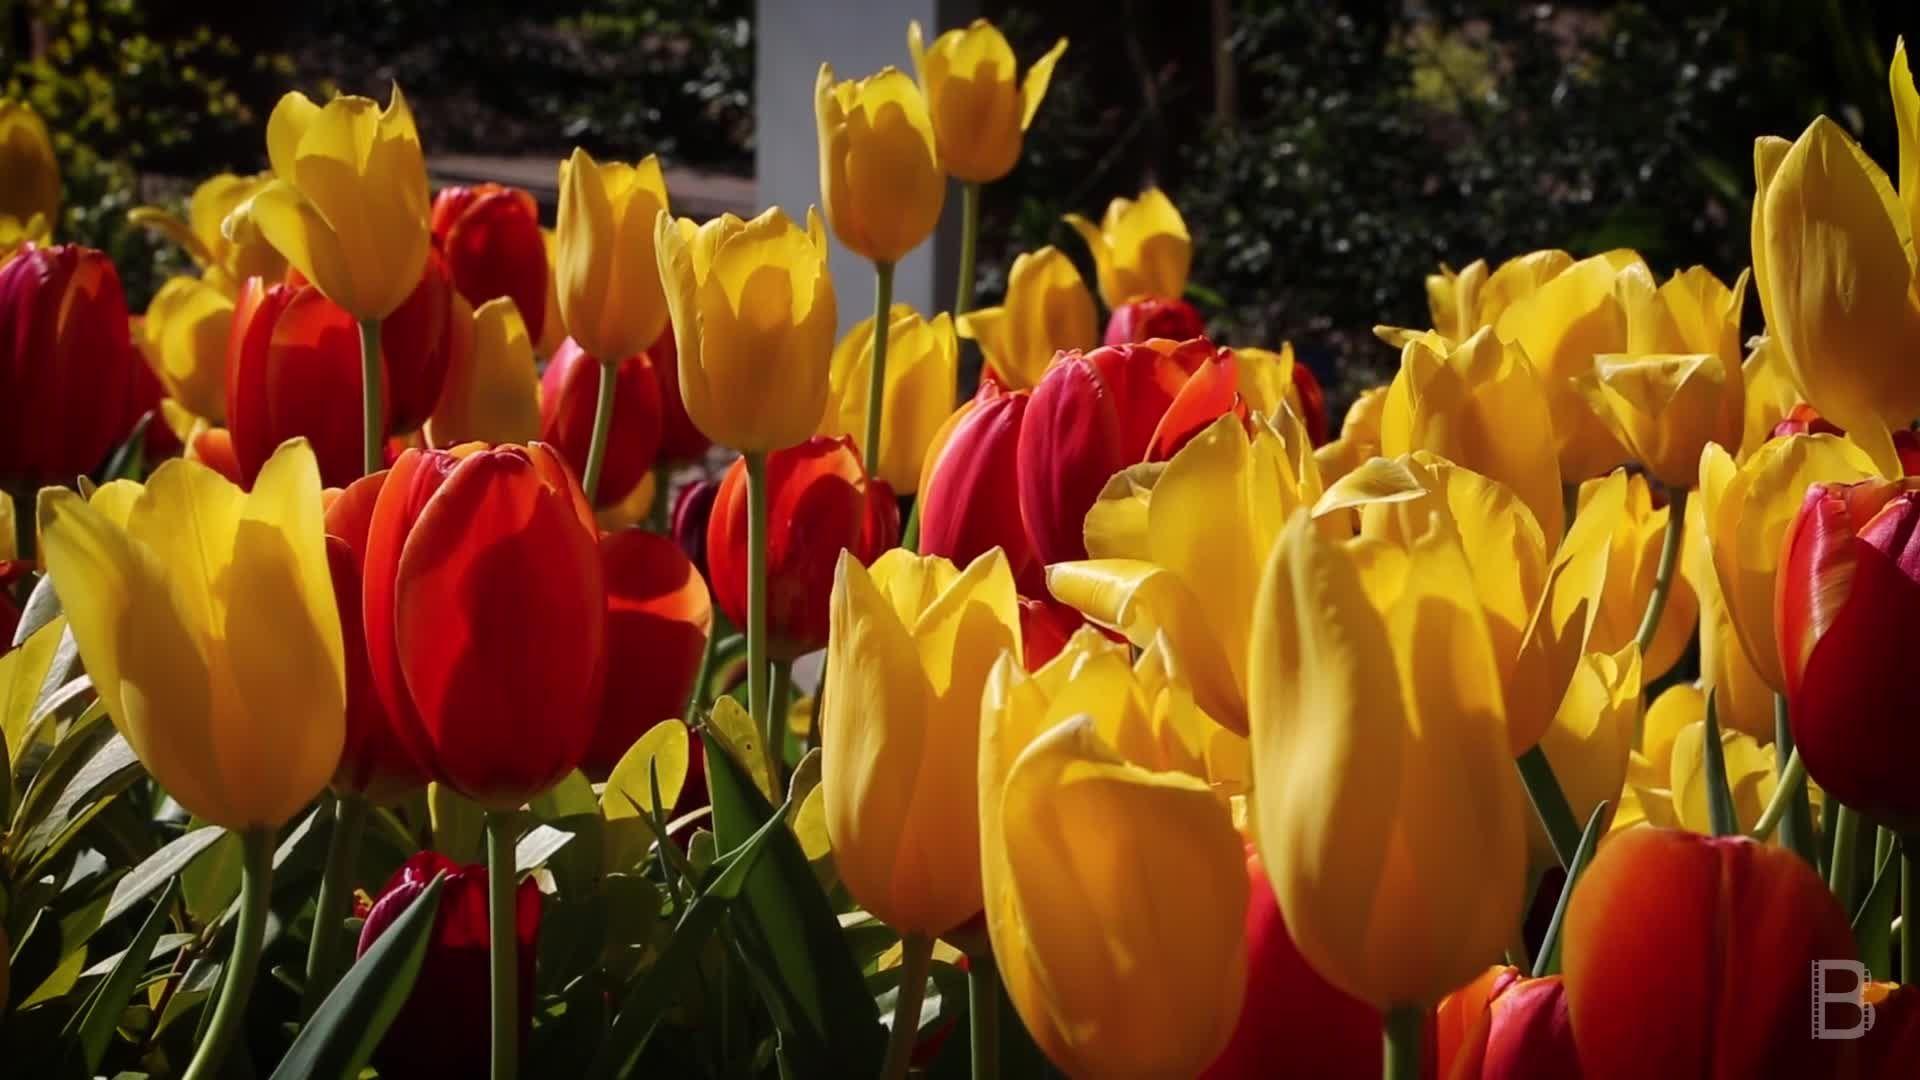 BELLA Presents: bello S1 Ep2 Flowers